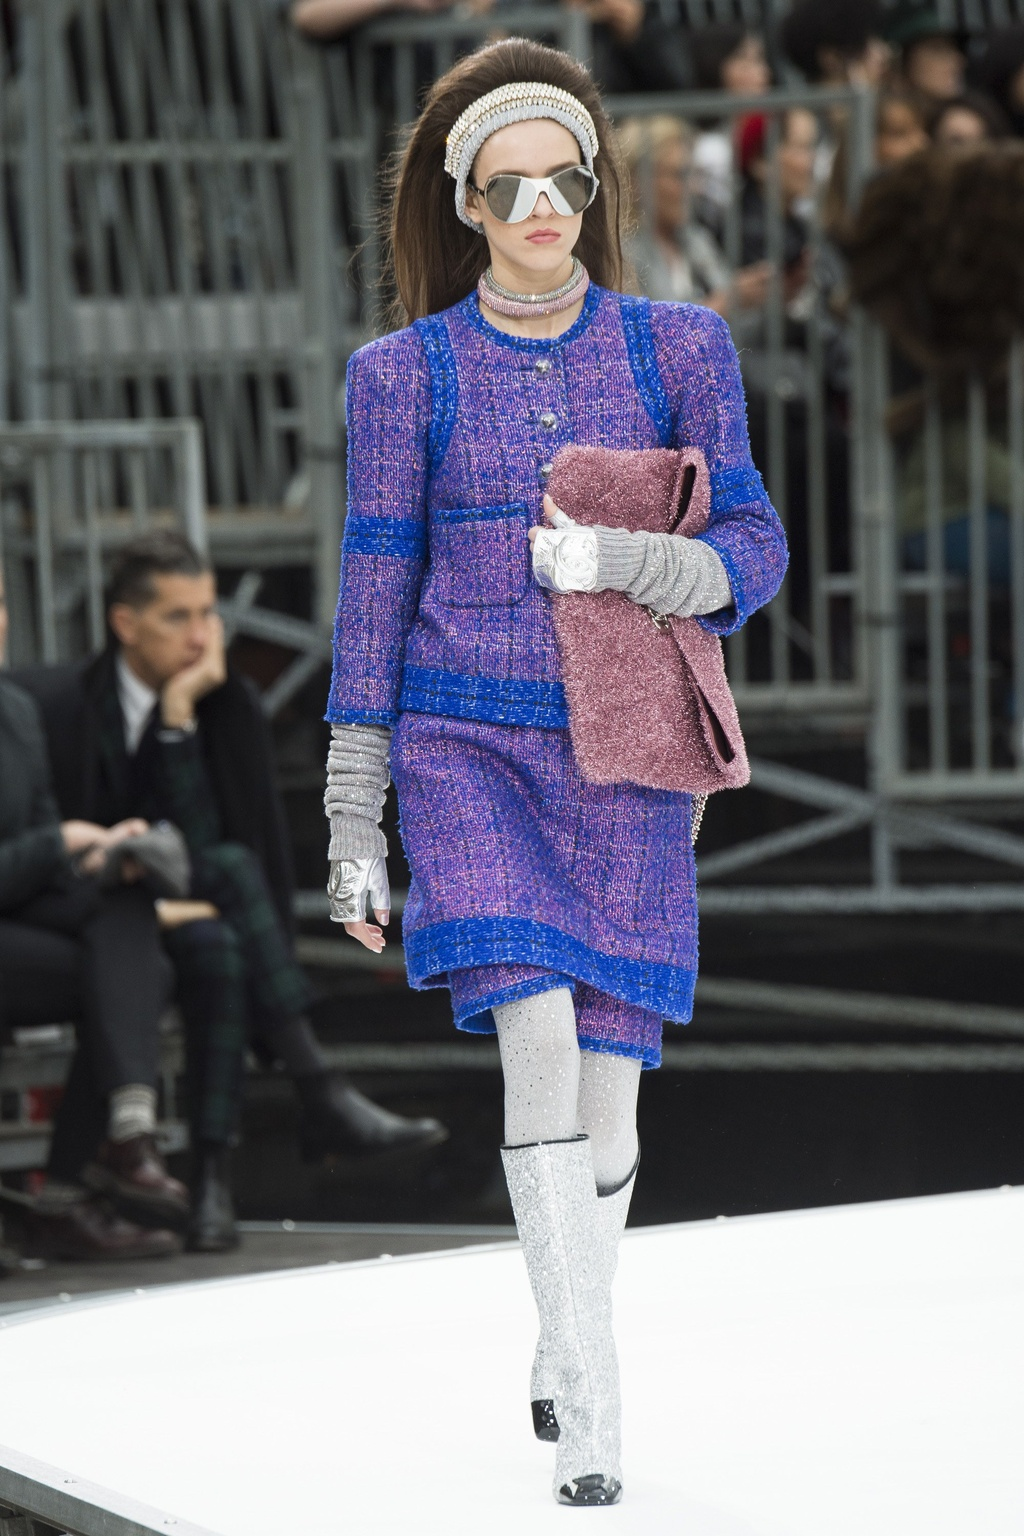 Show thoi trang Chanel: Tau vu tru bay len noc nha hinh anh 8